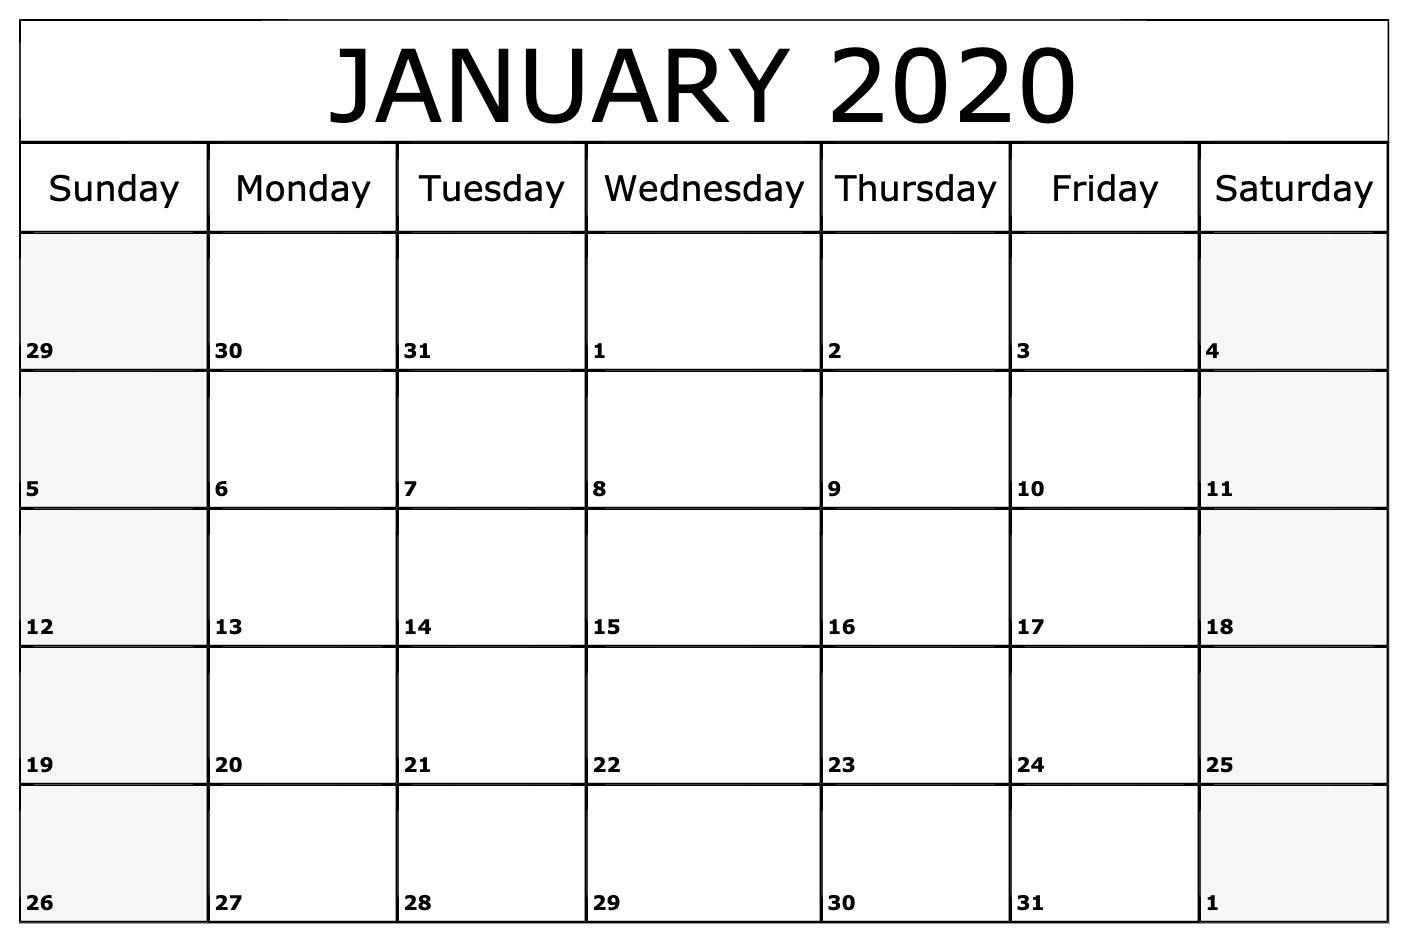 Blank January 2020 Calendar PDF